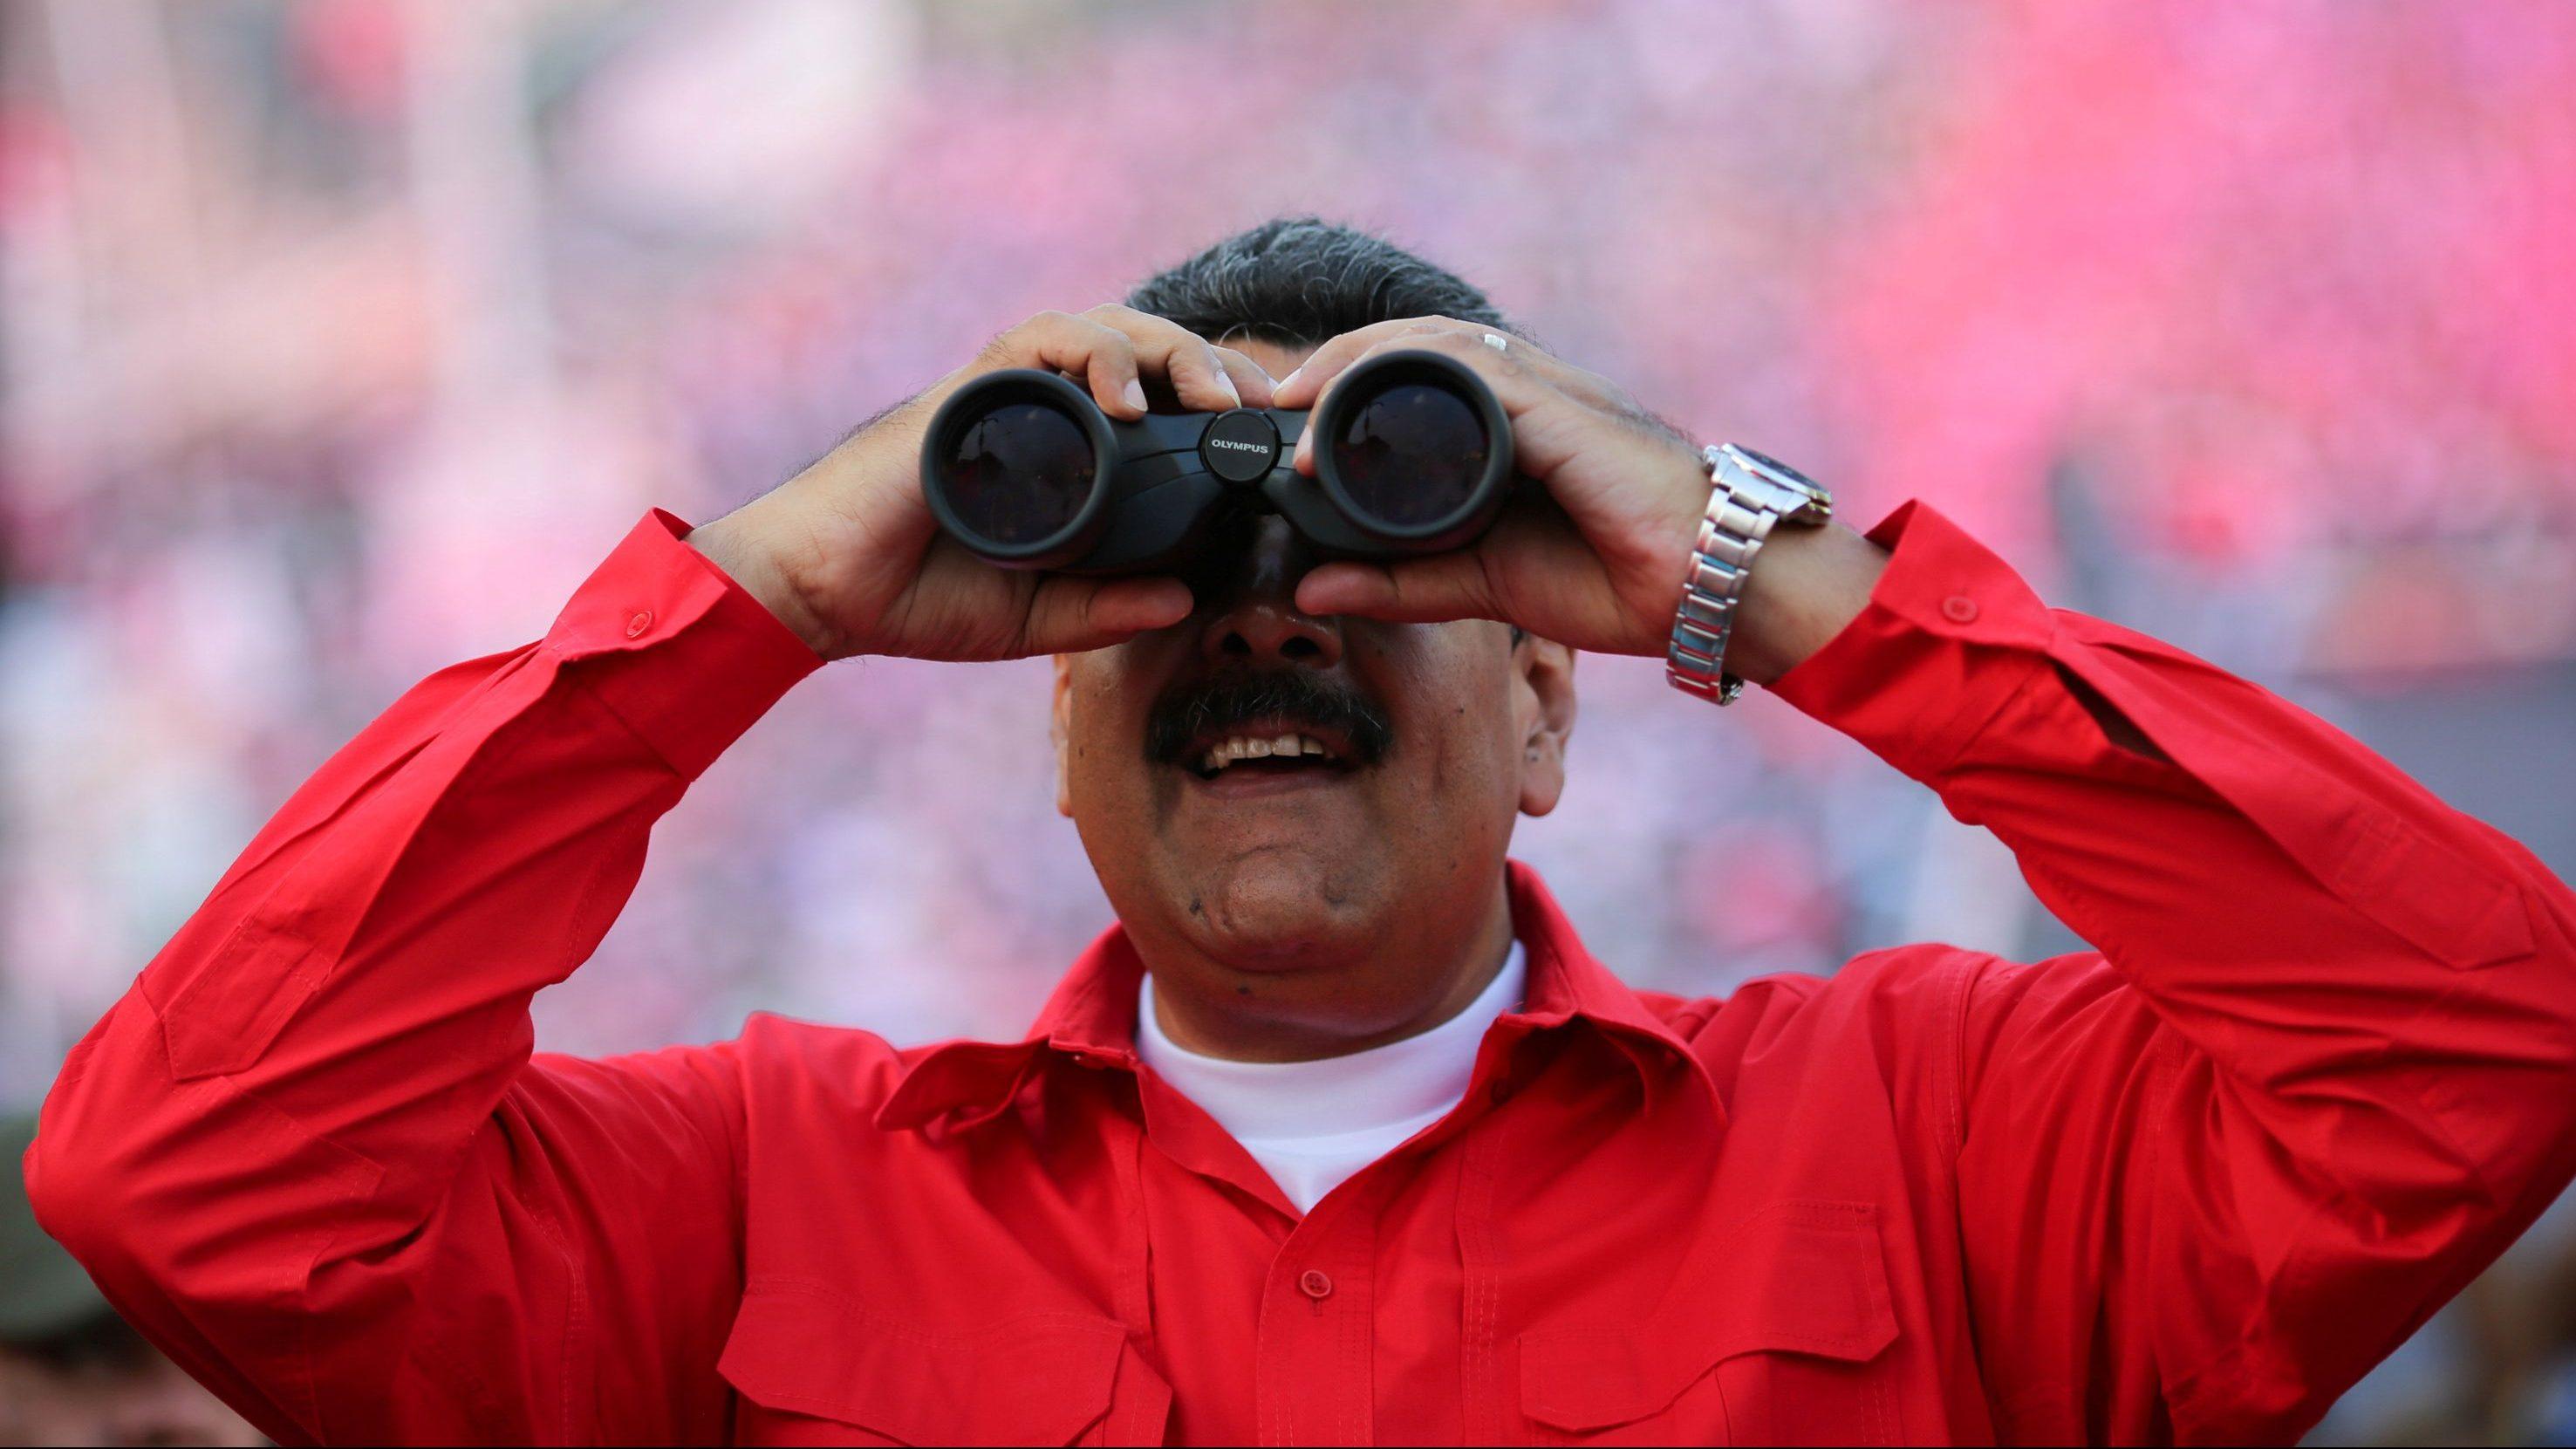 Venezuela's President Nicolas Maduro uses binoculars during a campaign rally in Cumana, Venezuela May 11, 2018.